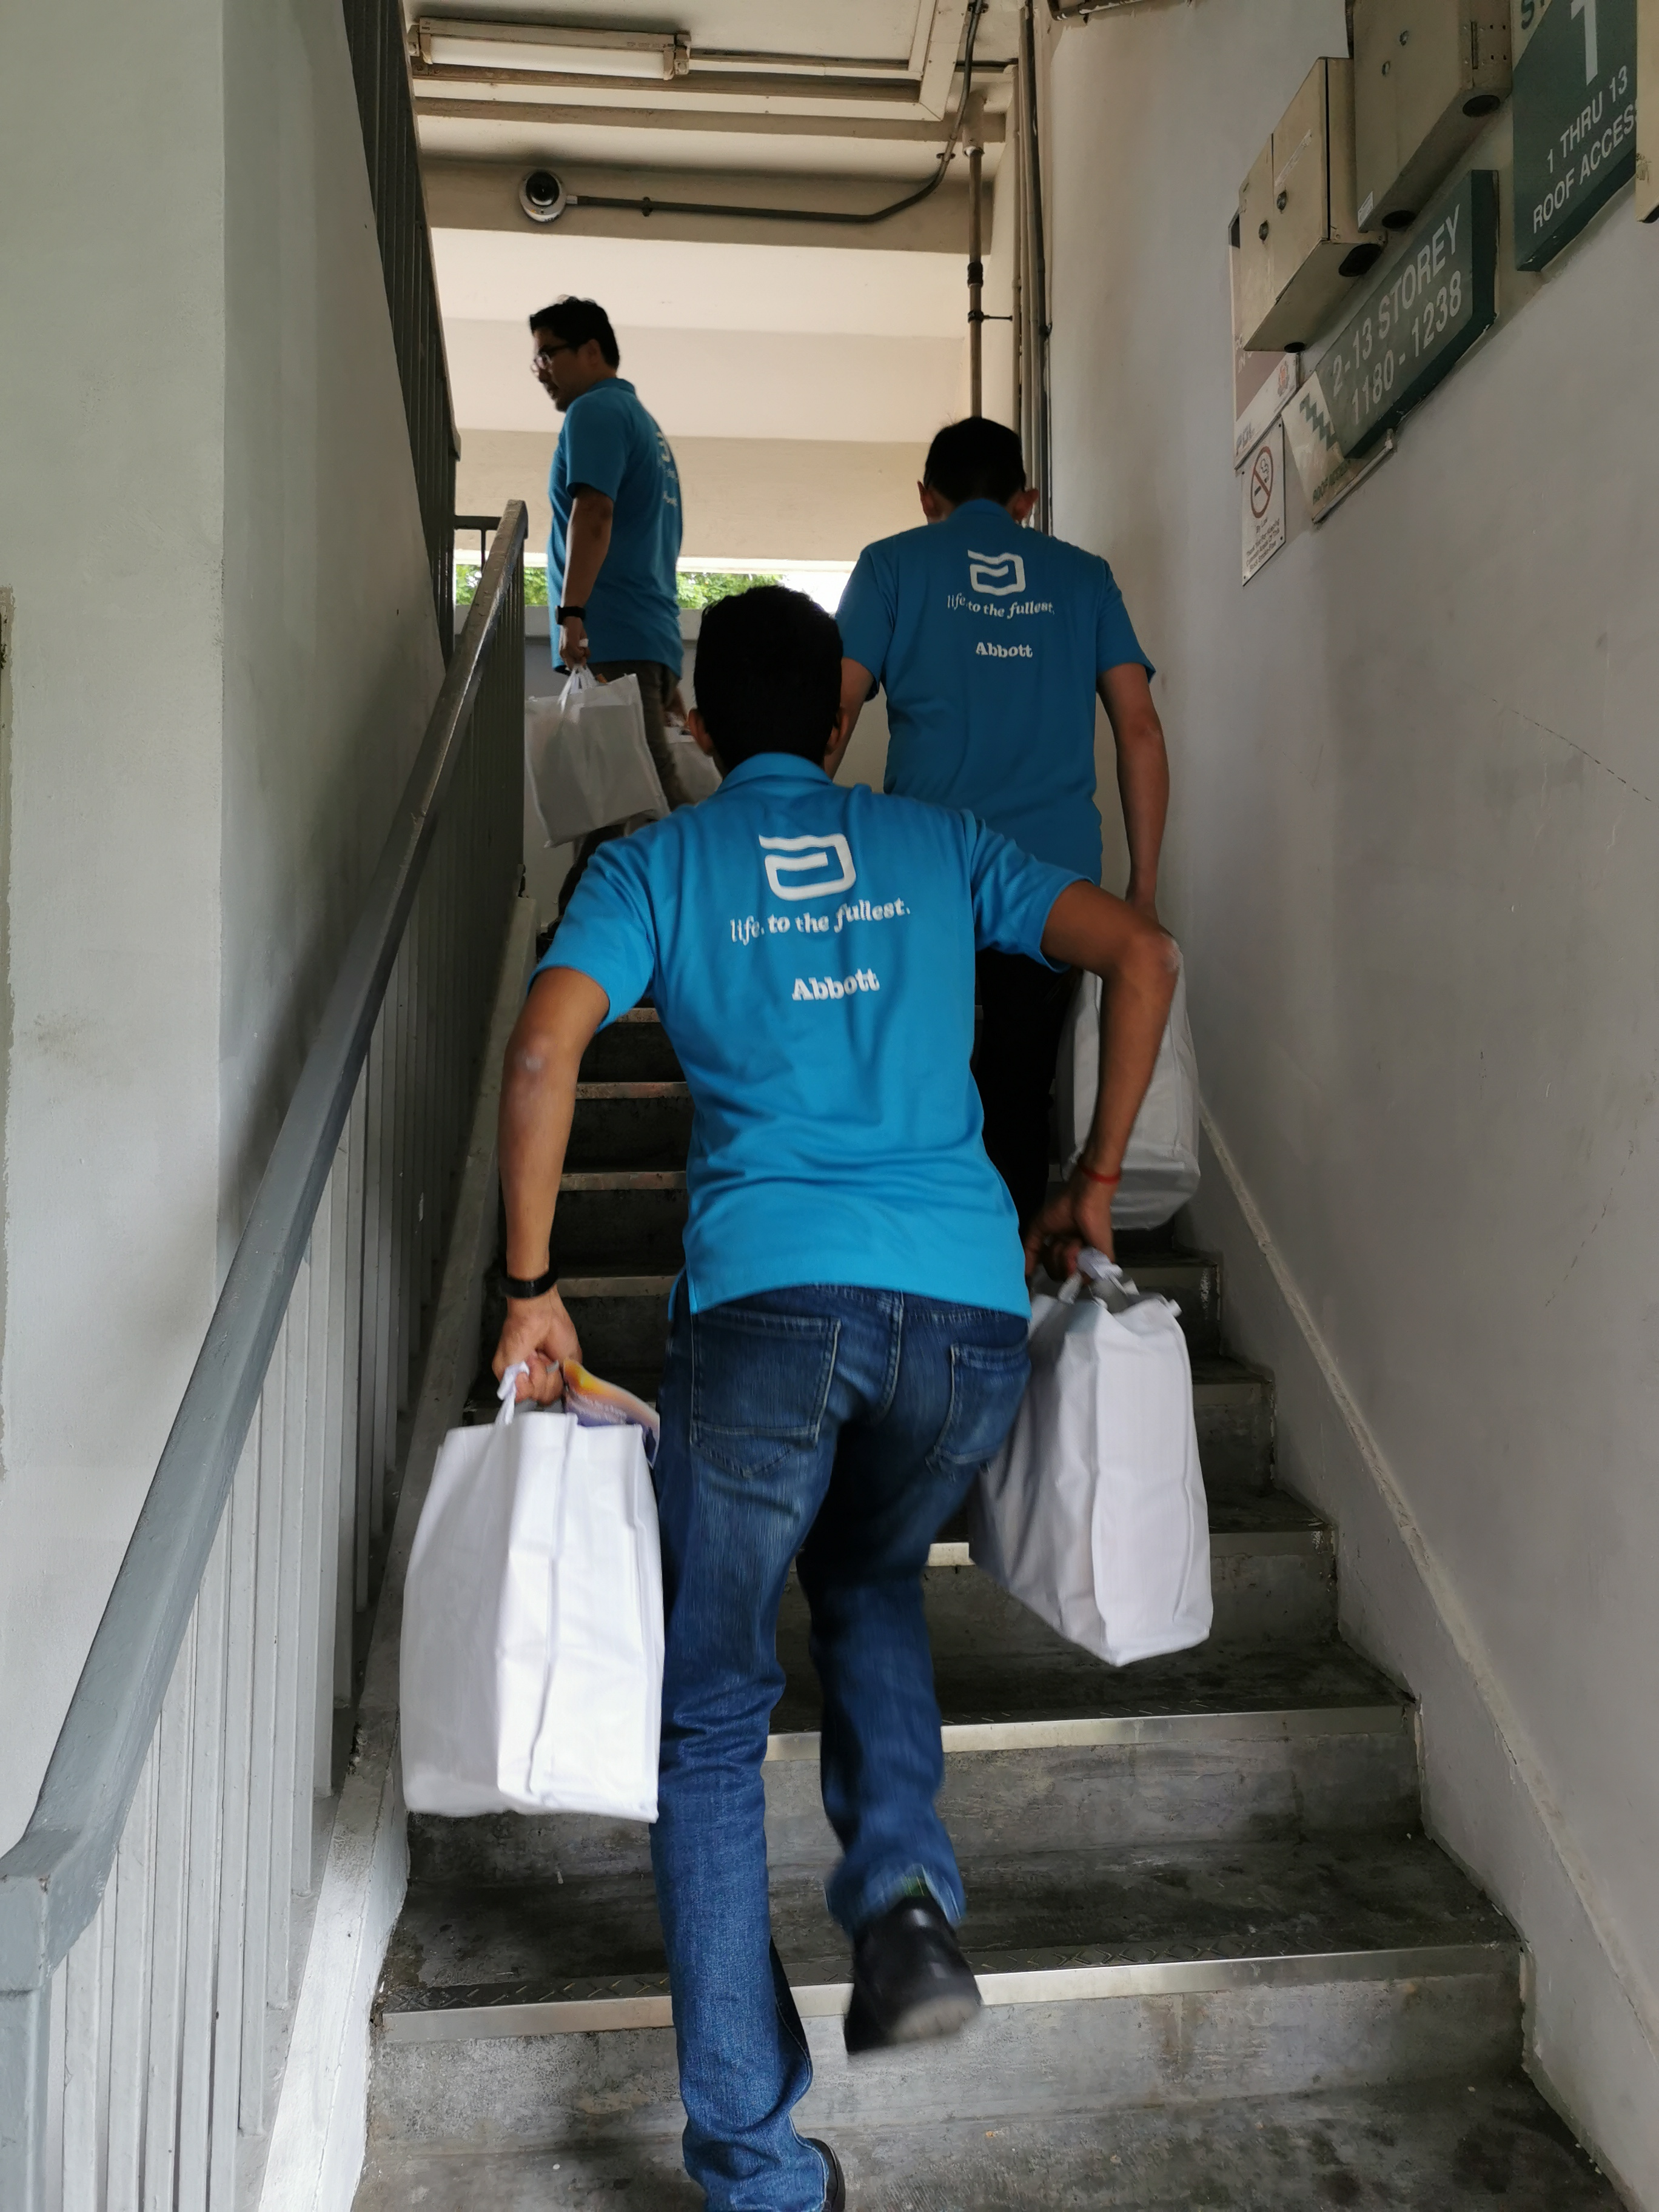 Abbott goodie bags